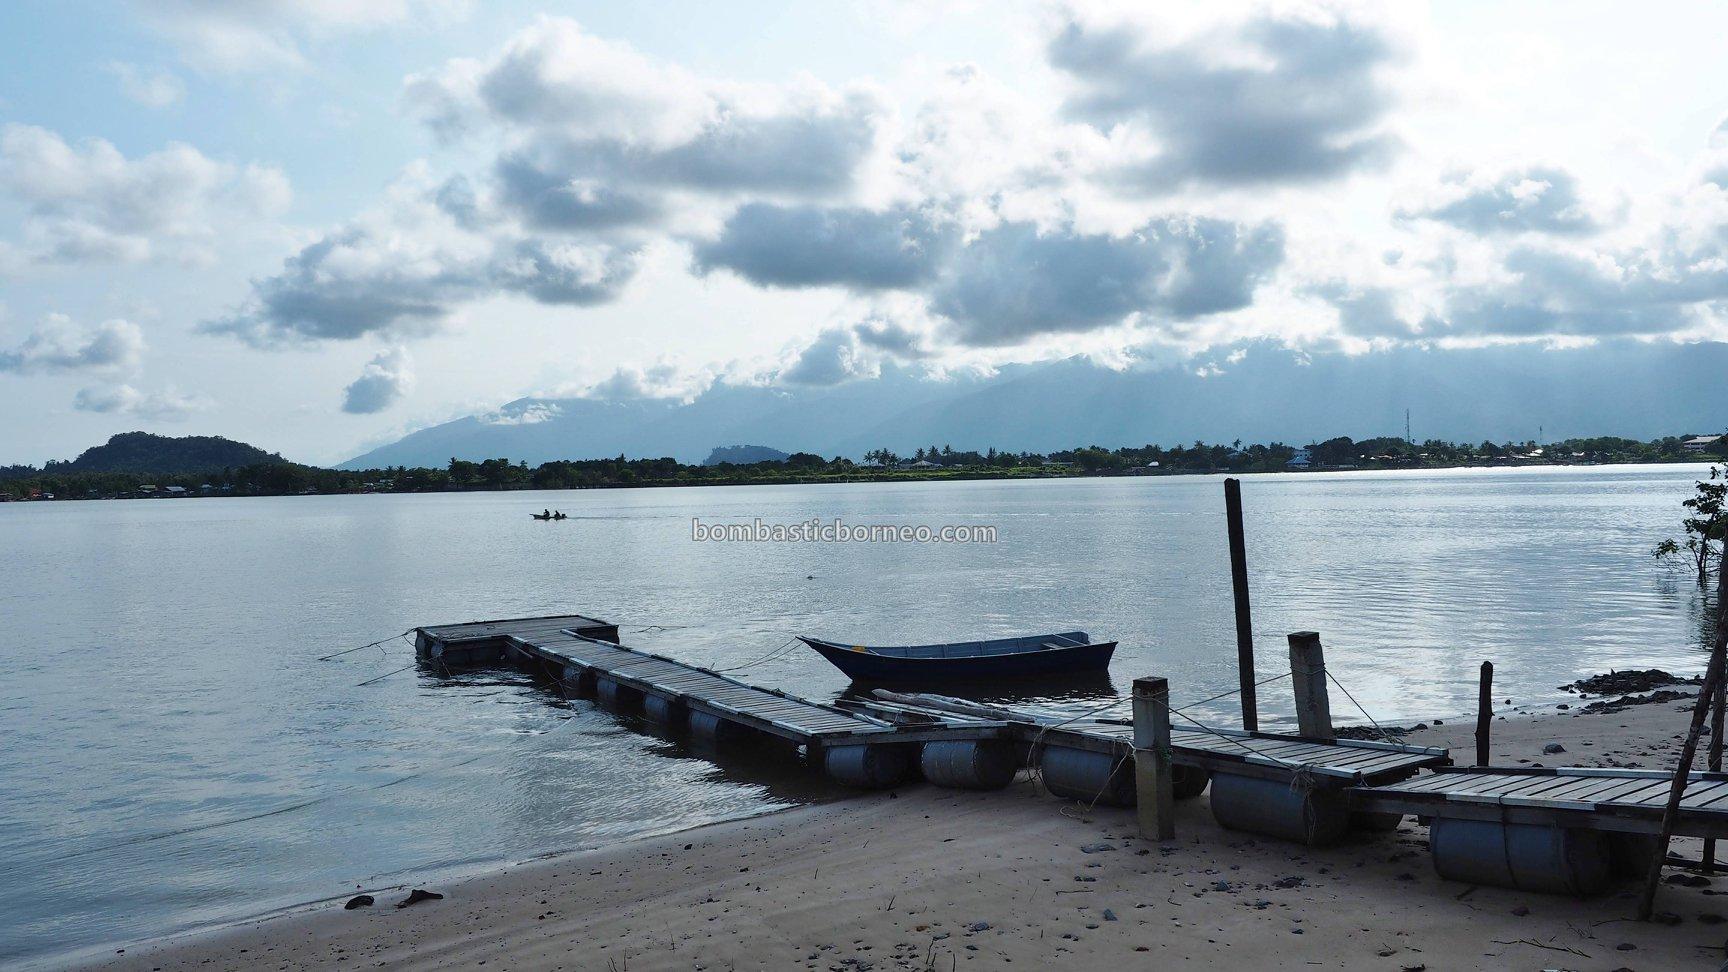 pantai, jetty, malay village, alam, nature, beachside, destination, Borneo, Kuching, Tourism, tourist attraction, travel guide, 古晋砂拉越, 马来西亚旅游